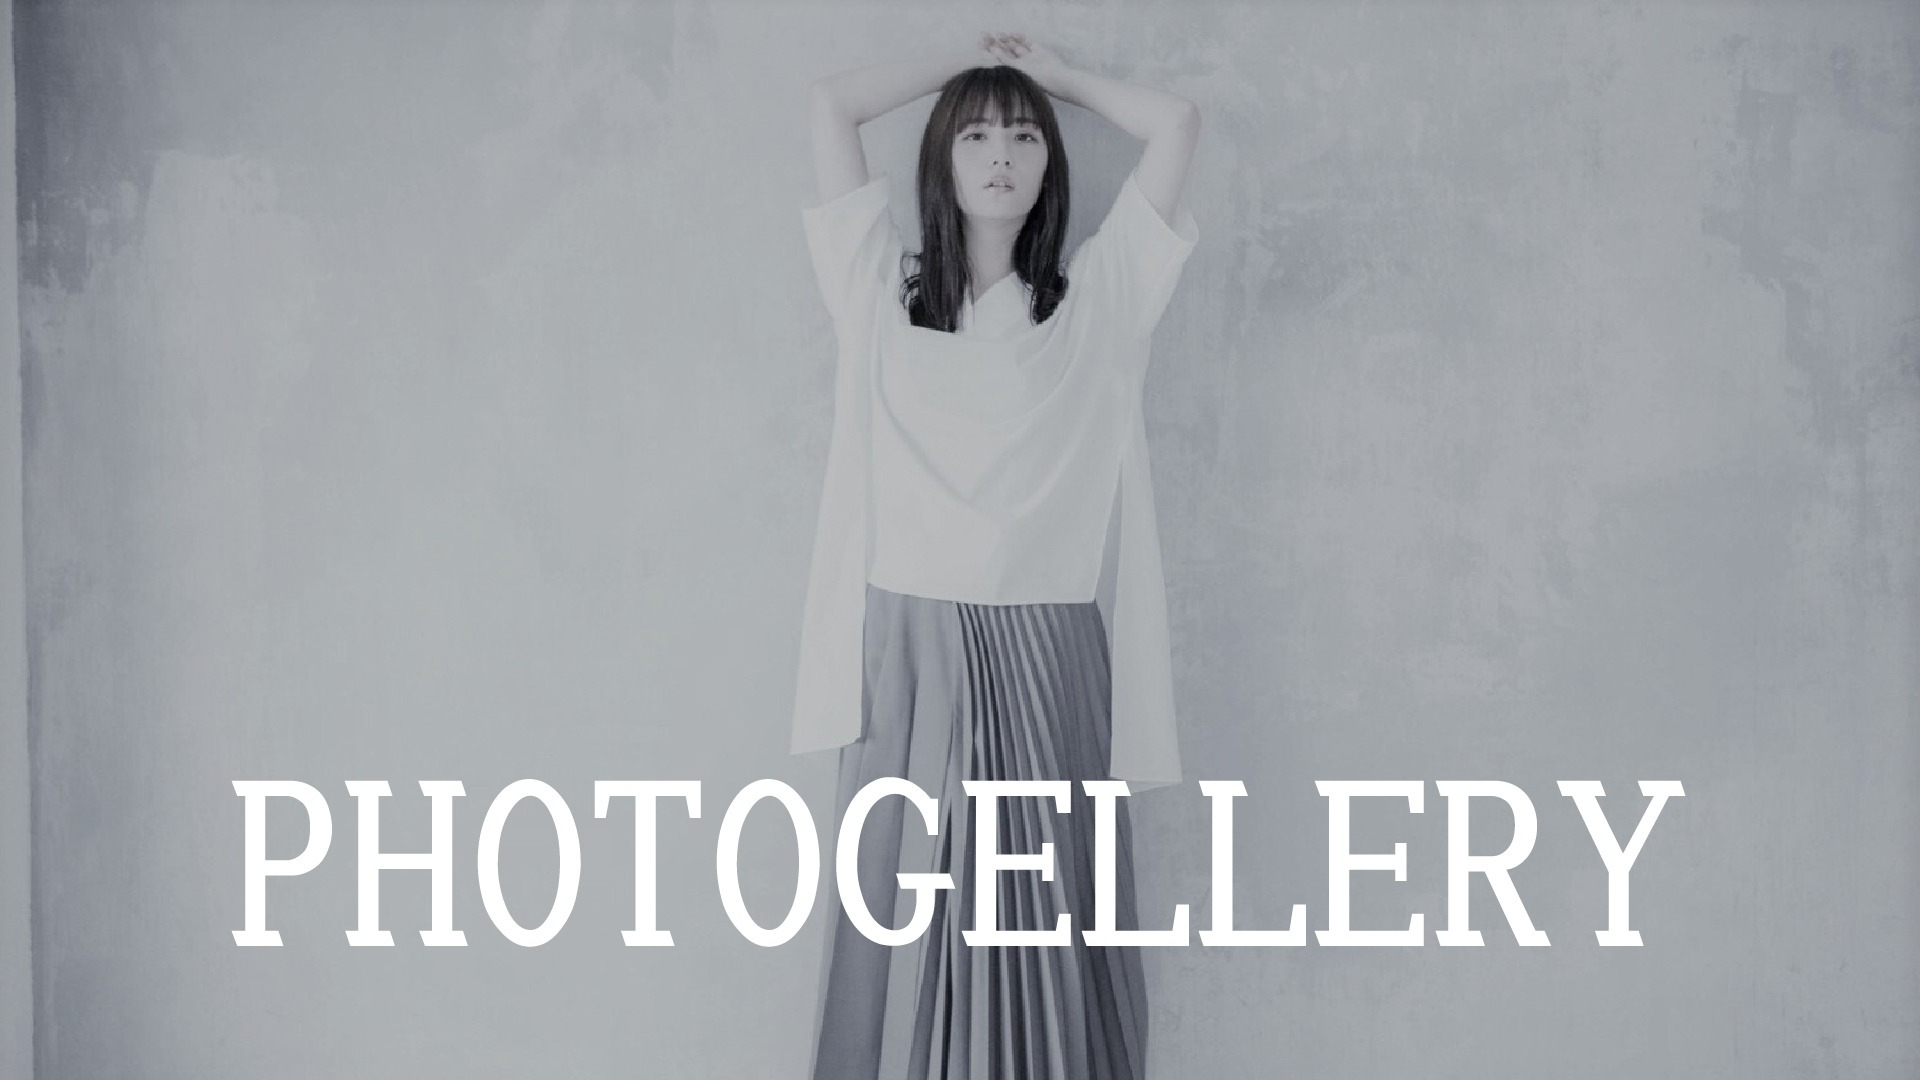 photogallery #2